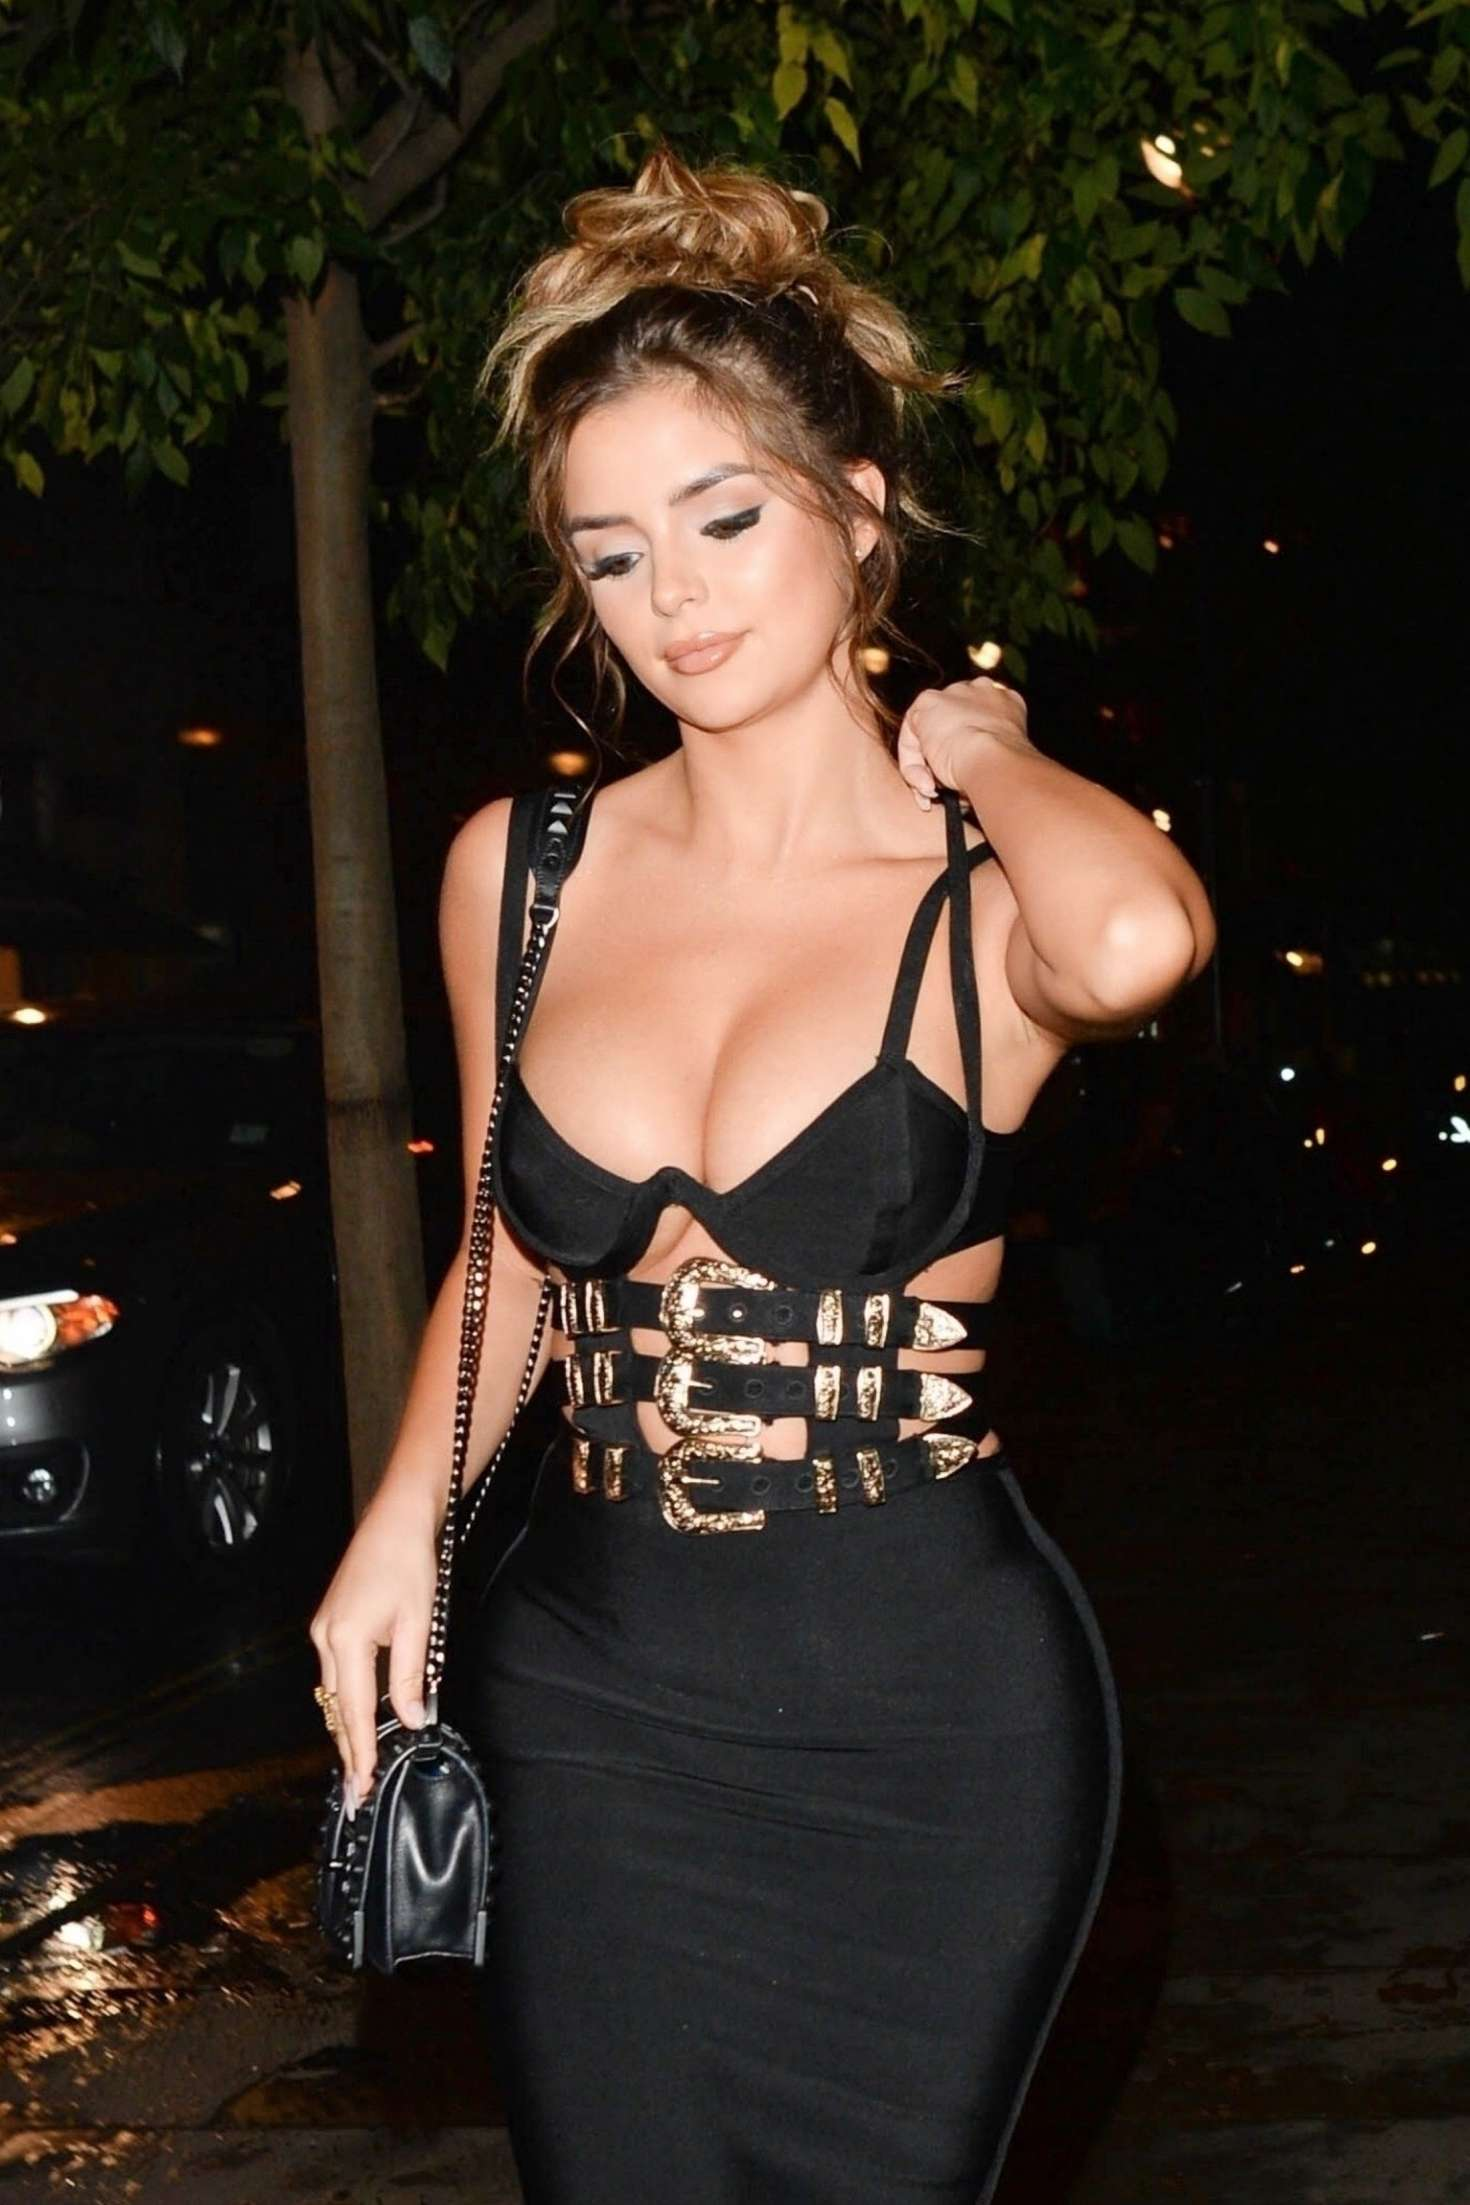 Demi Rose - Leaving Toyroom nightclub in London